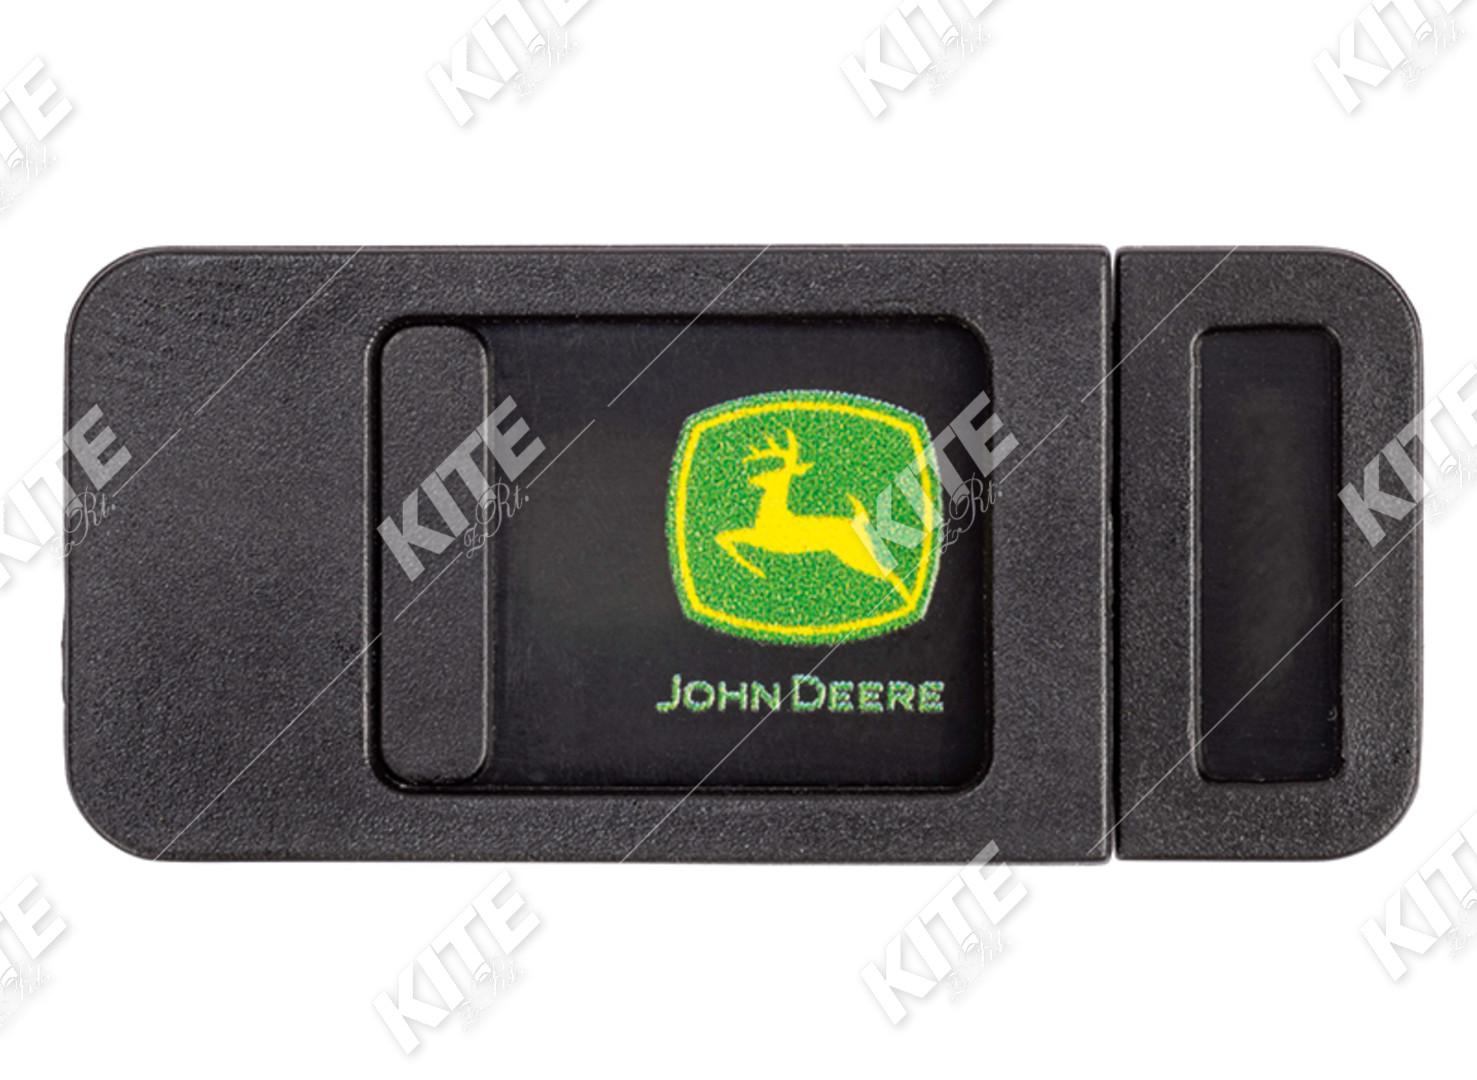 John Deere webkamera takaró